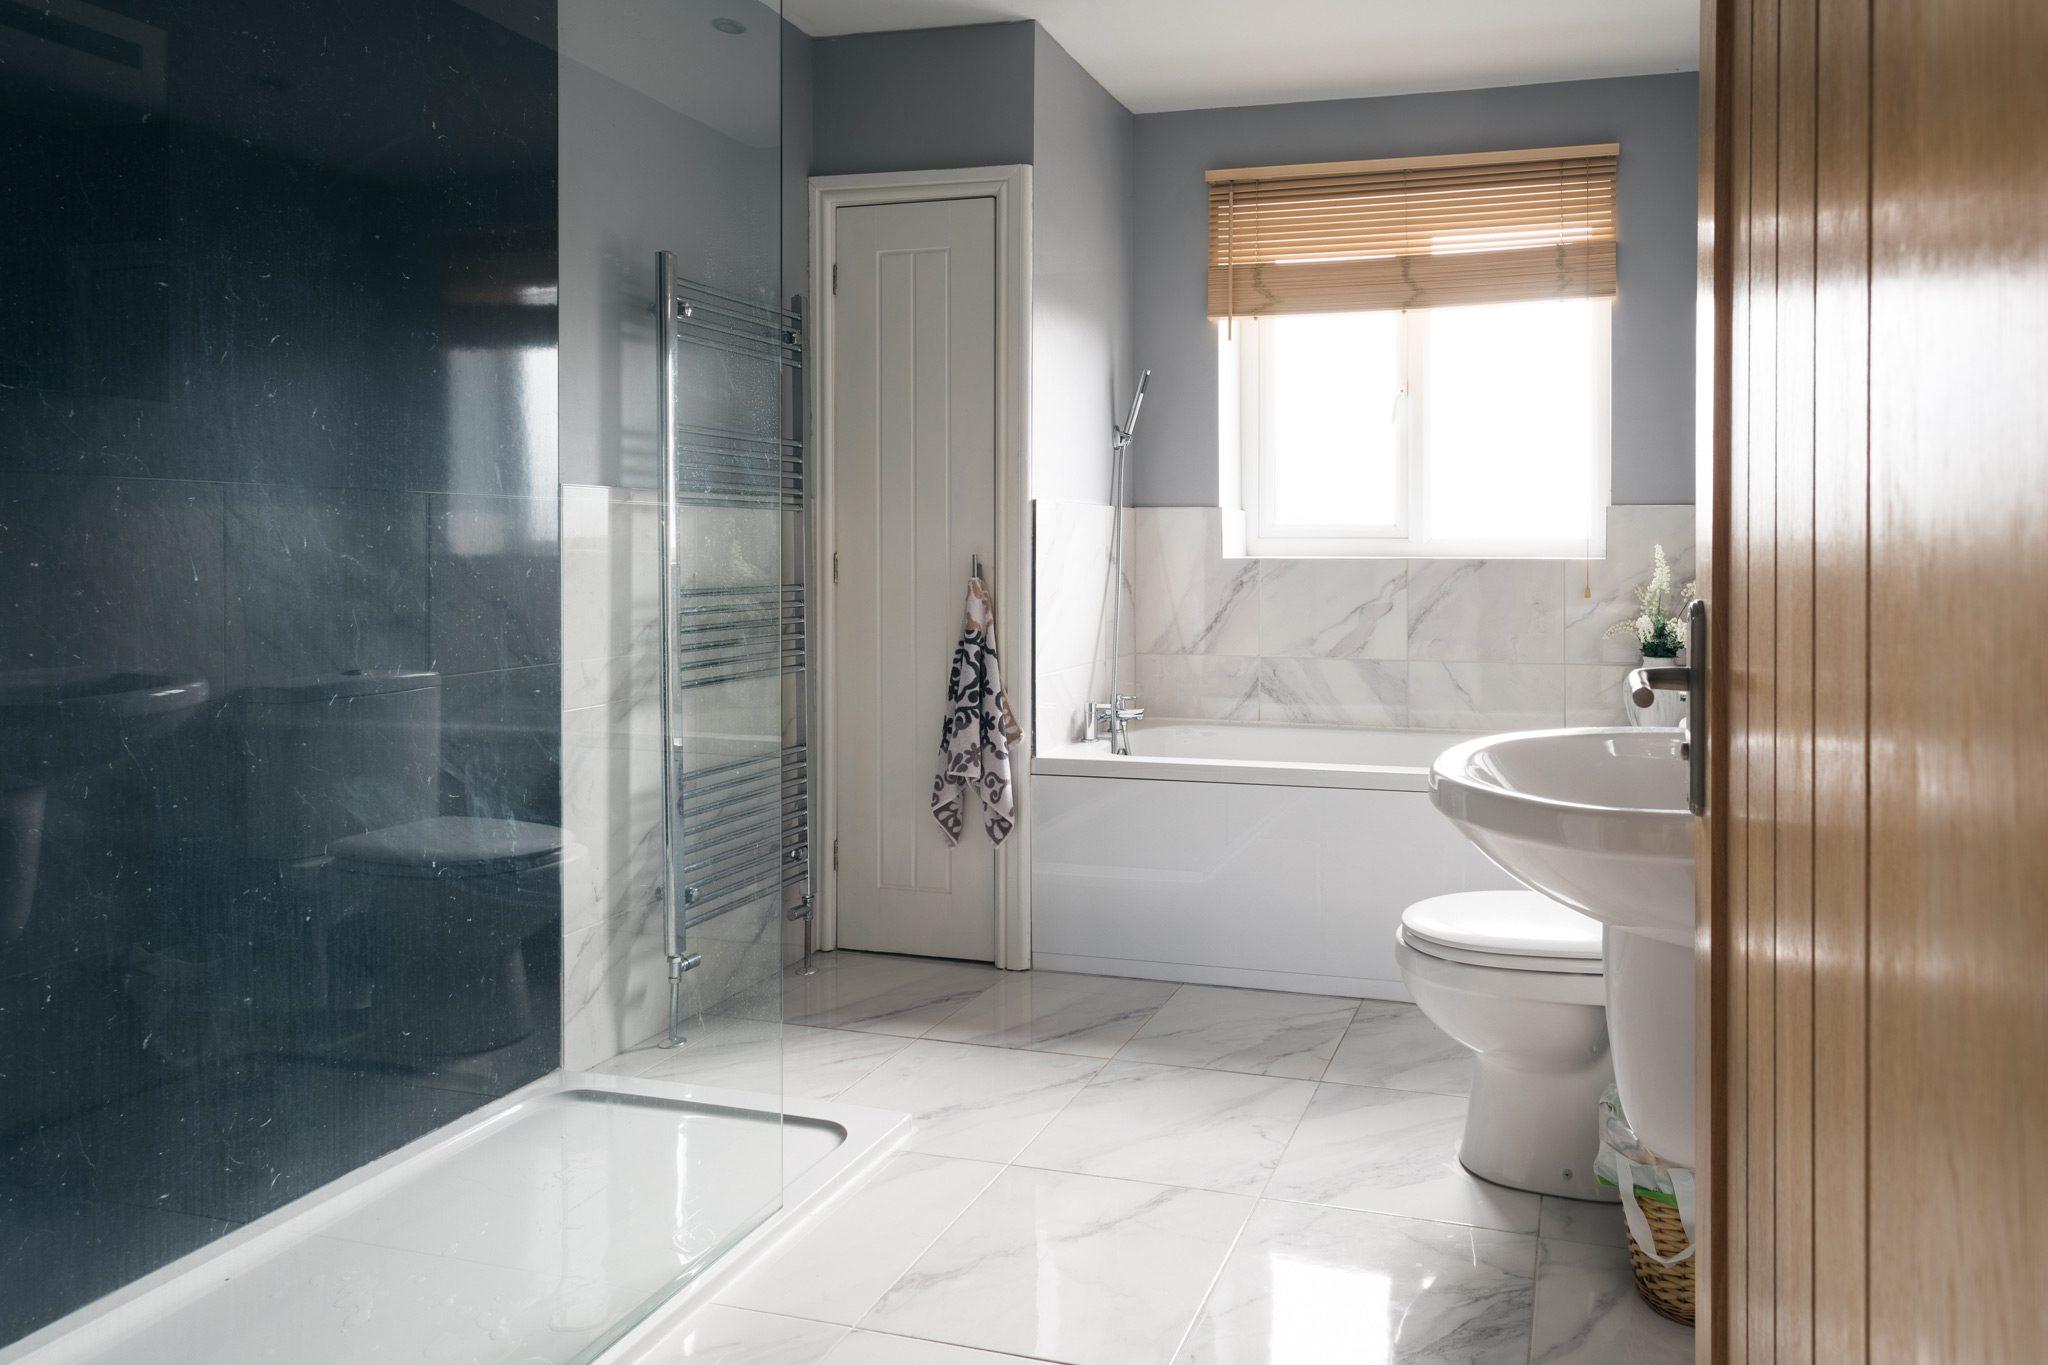 Real Estate - Bathroom